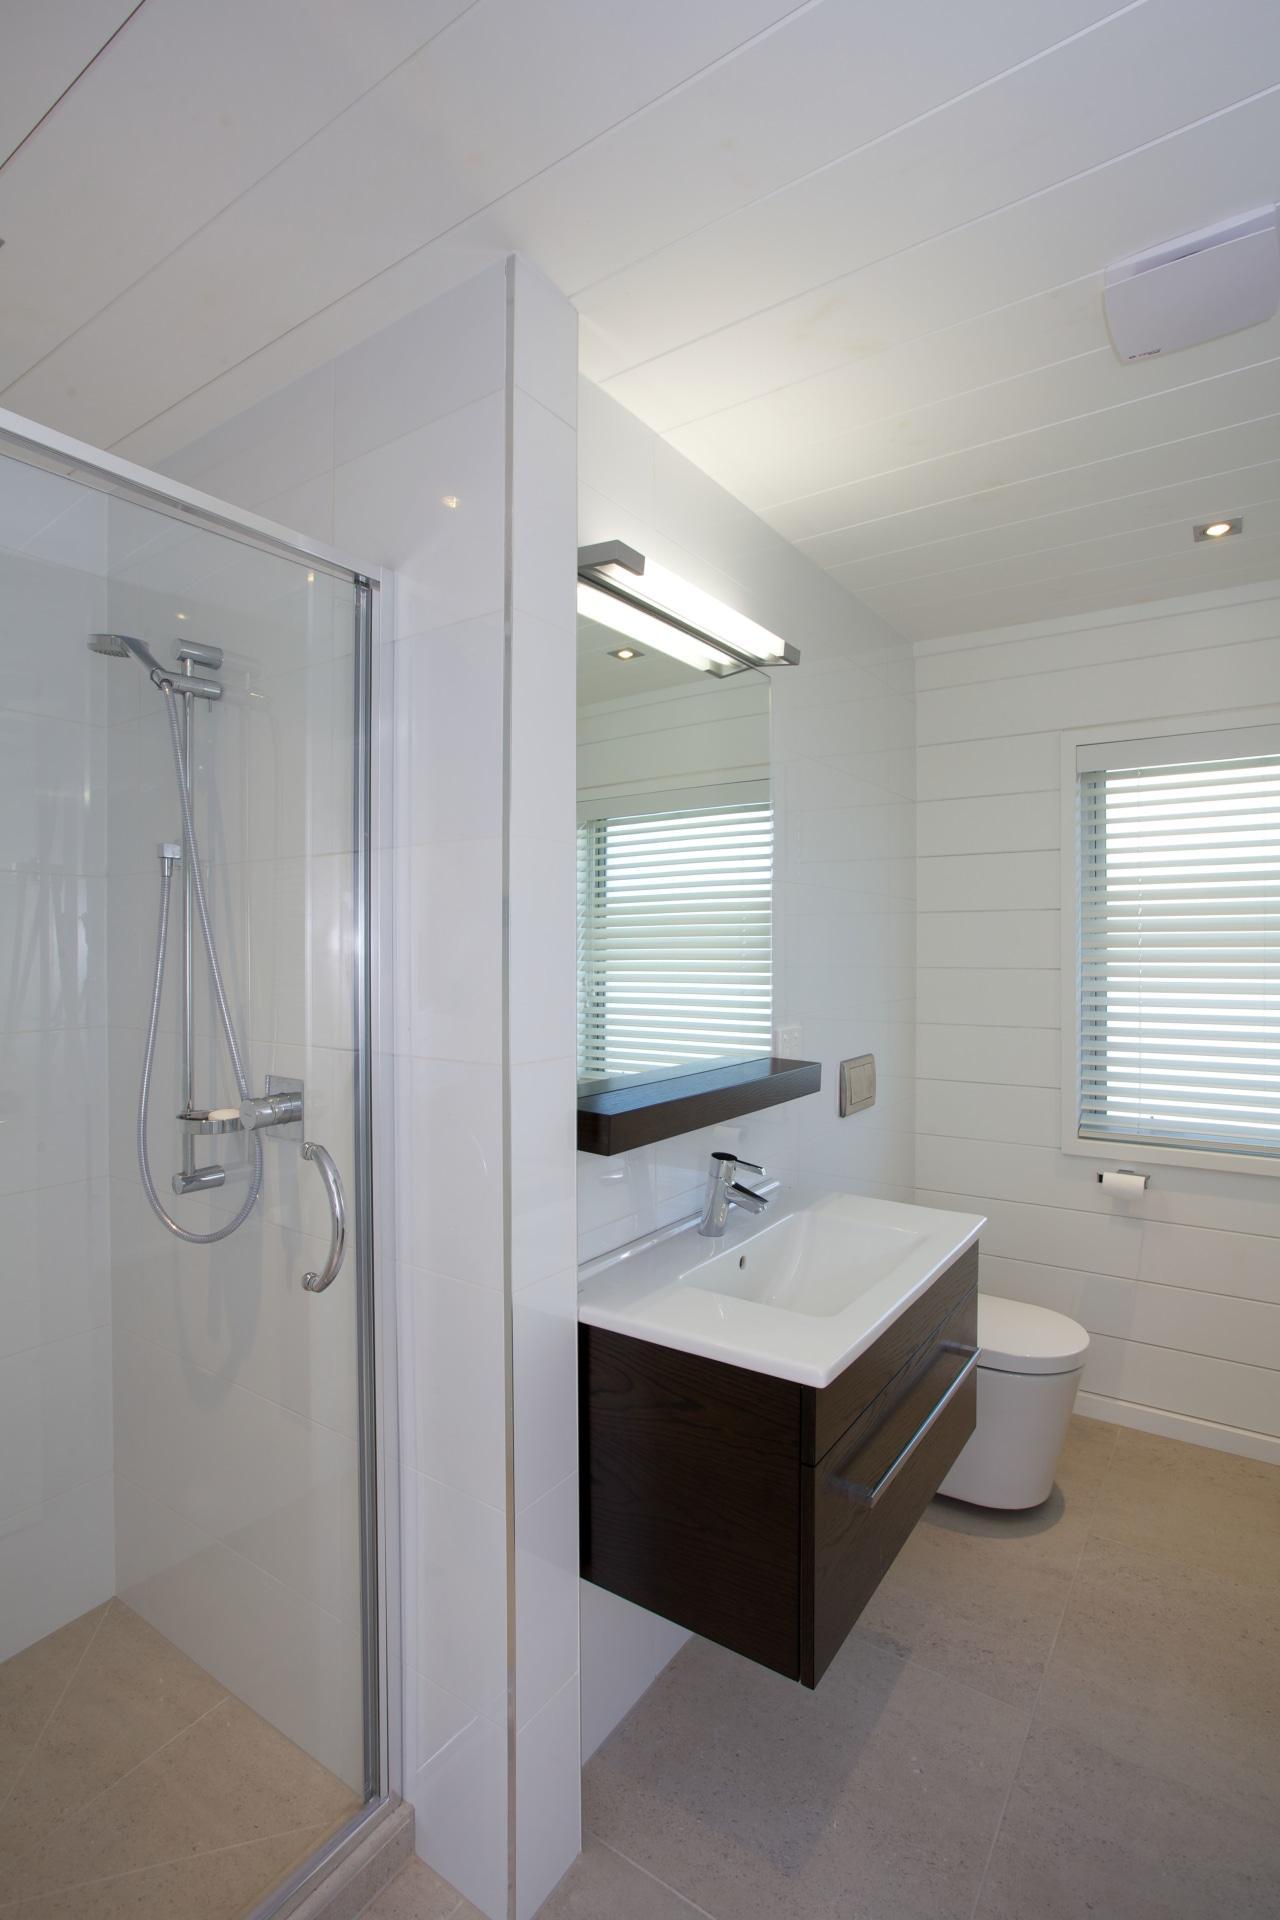 Beach home bathroom bathroom, home, interior design, plumbing fixture, real estate, room, sink, gray